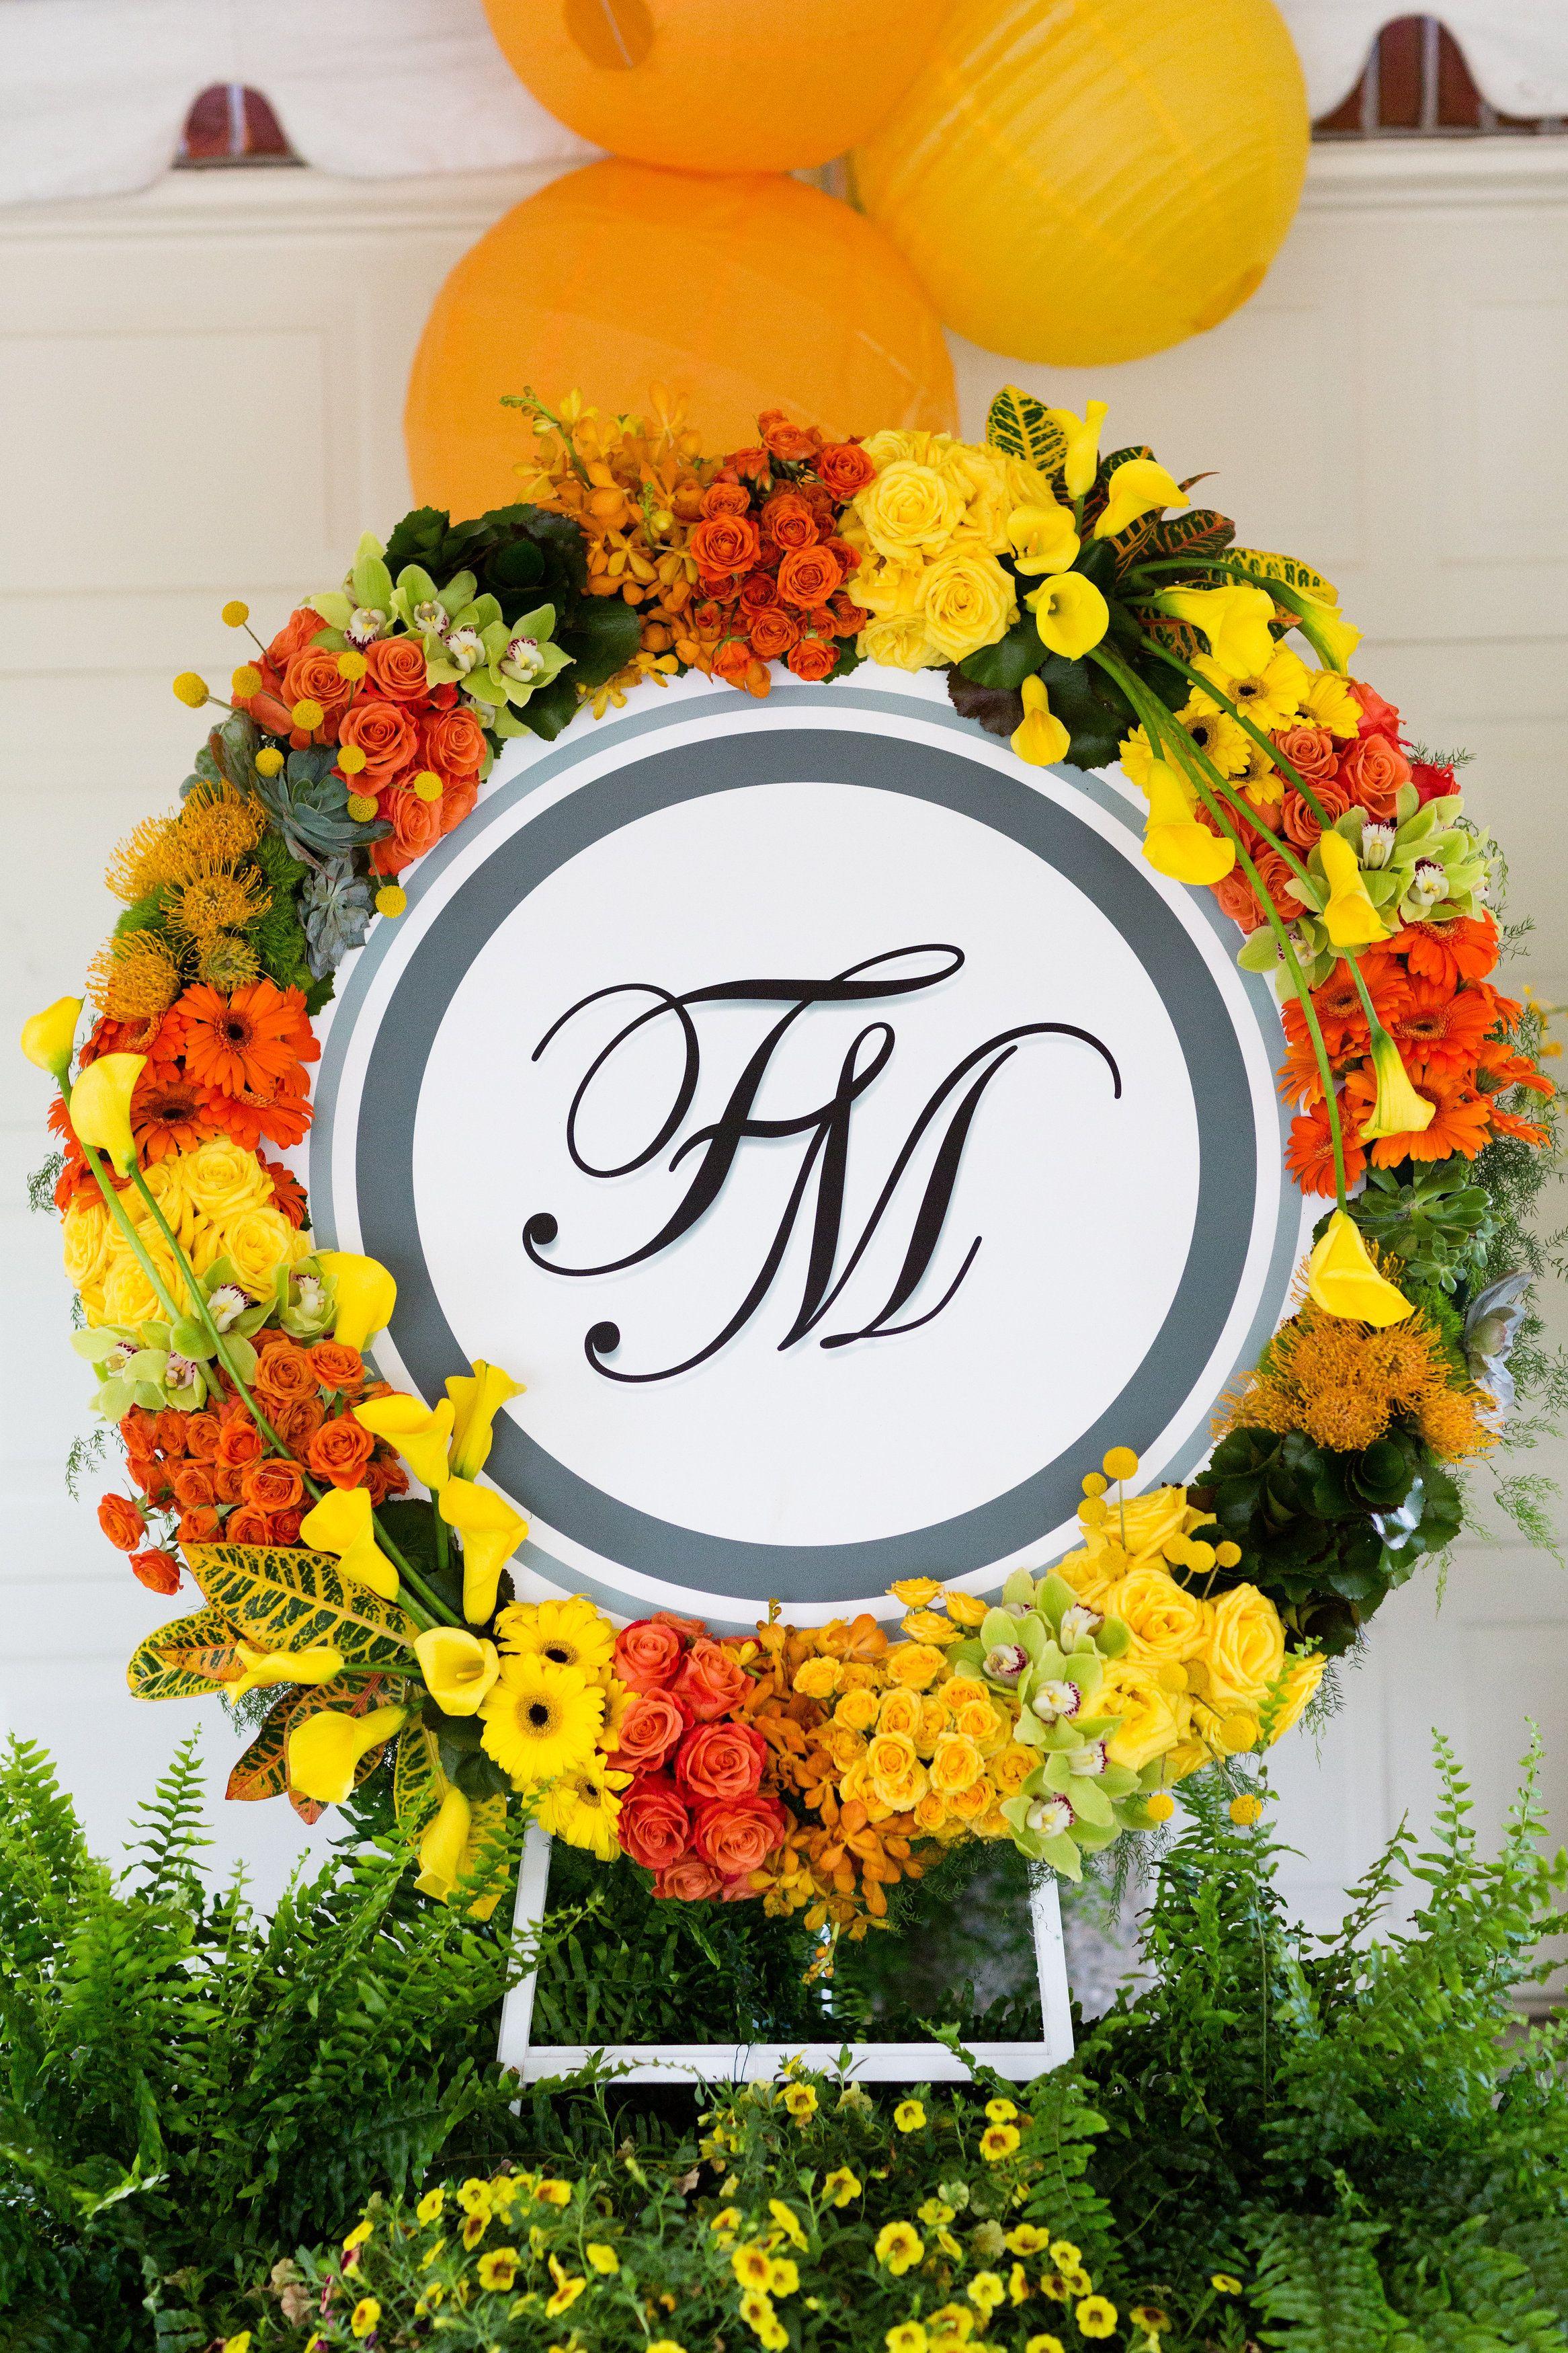 A stunning floral wreath surrounding their monogram